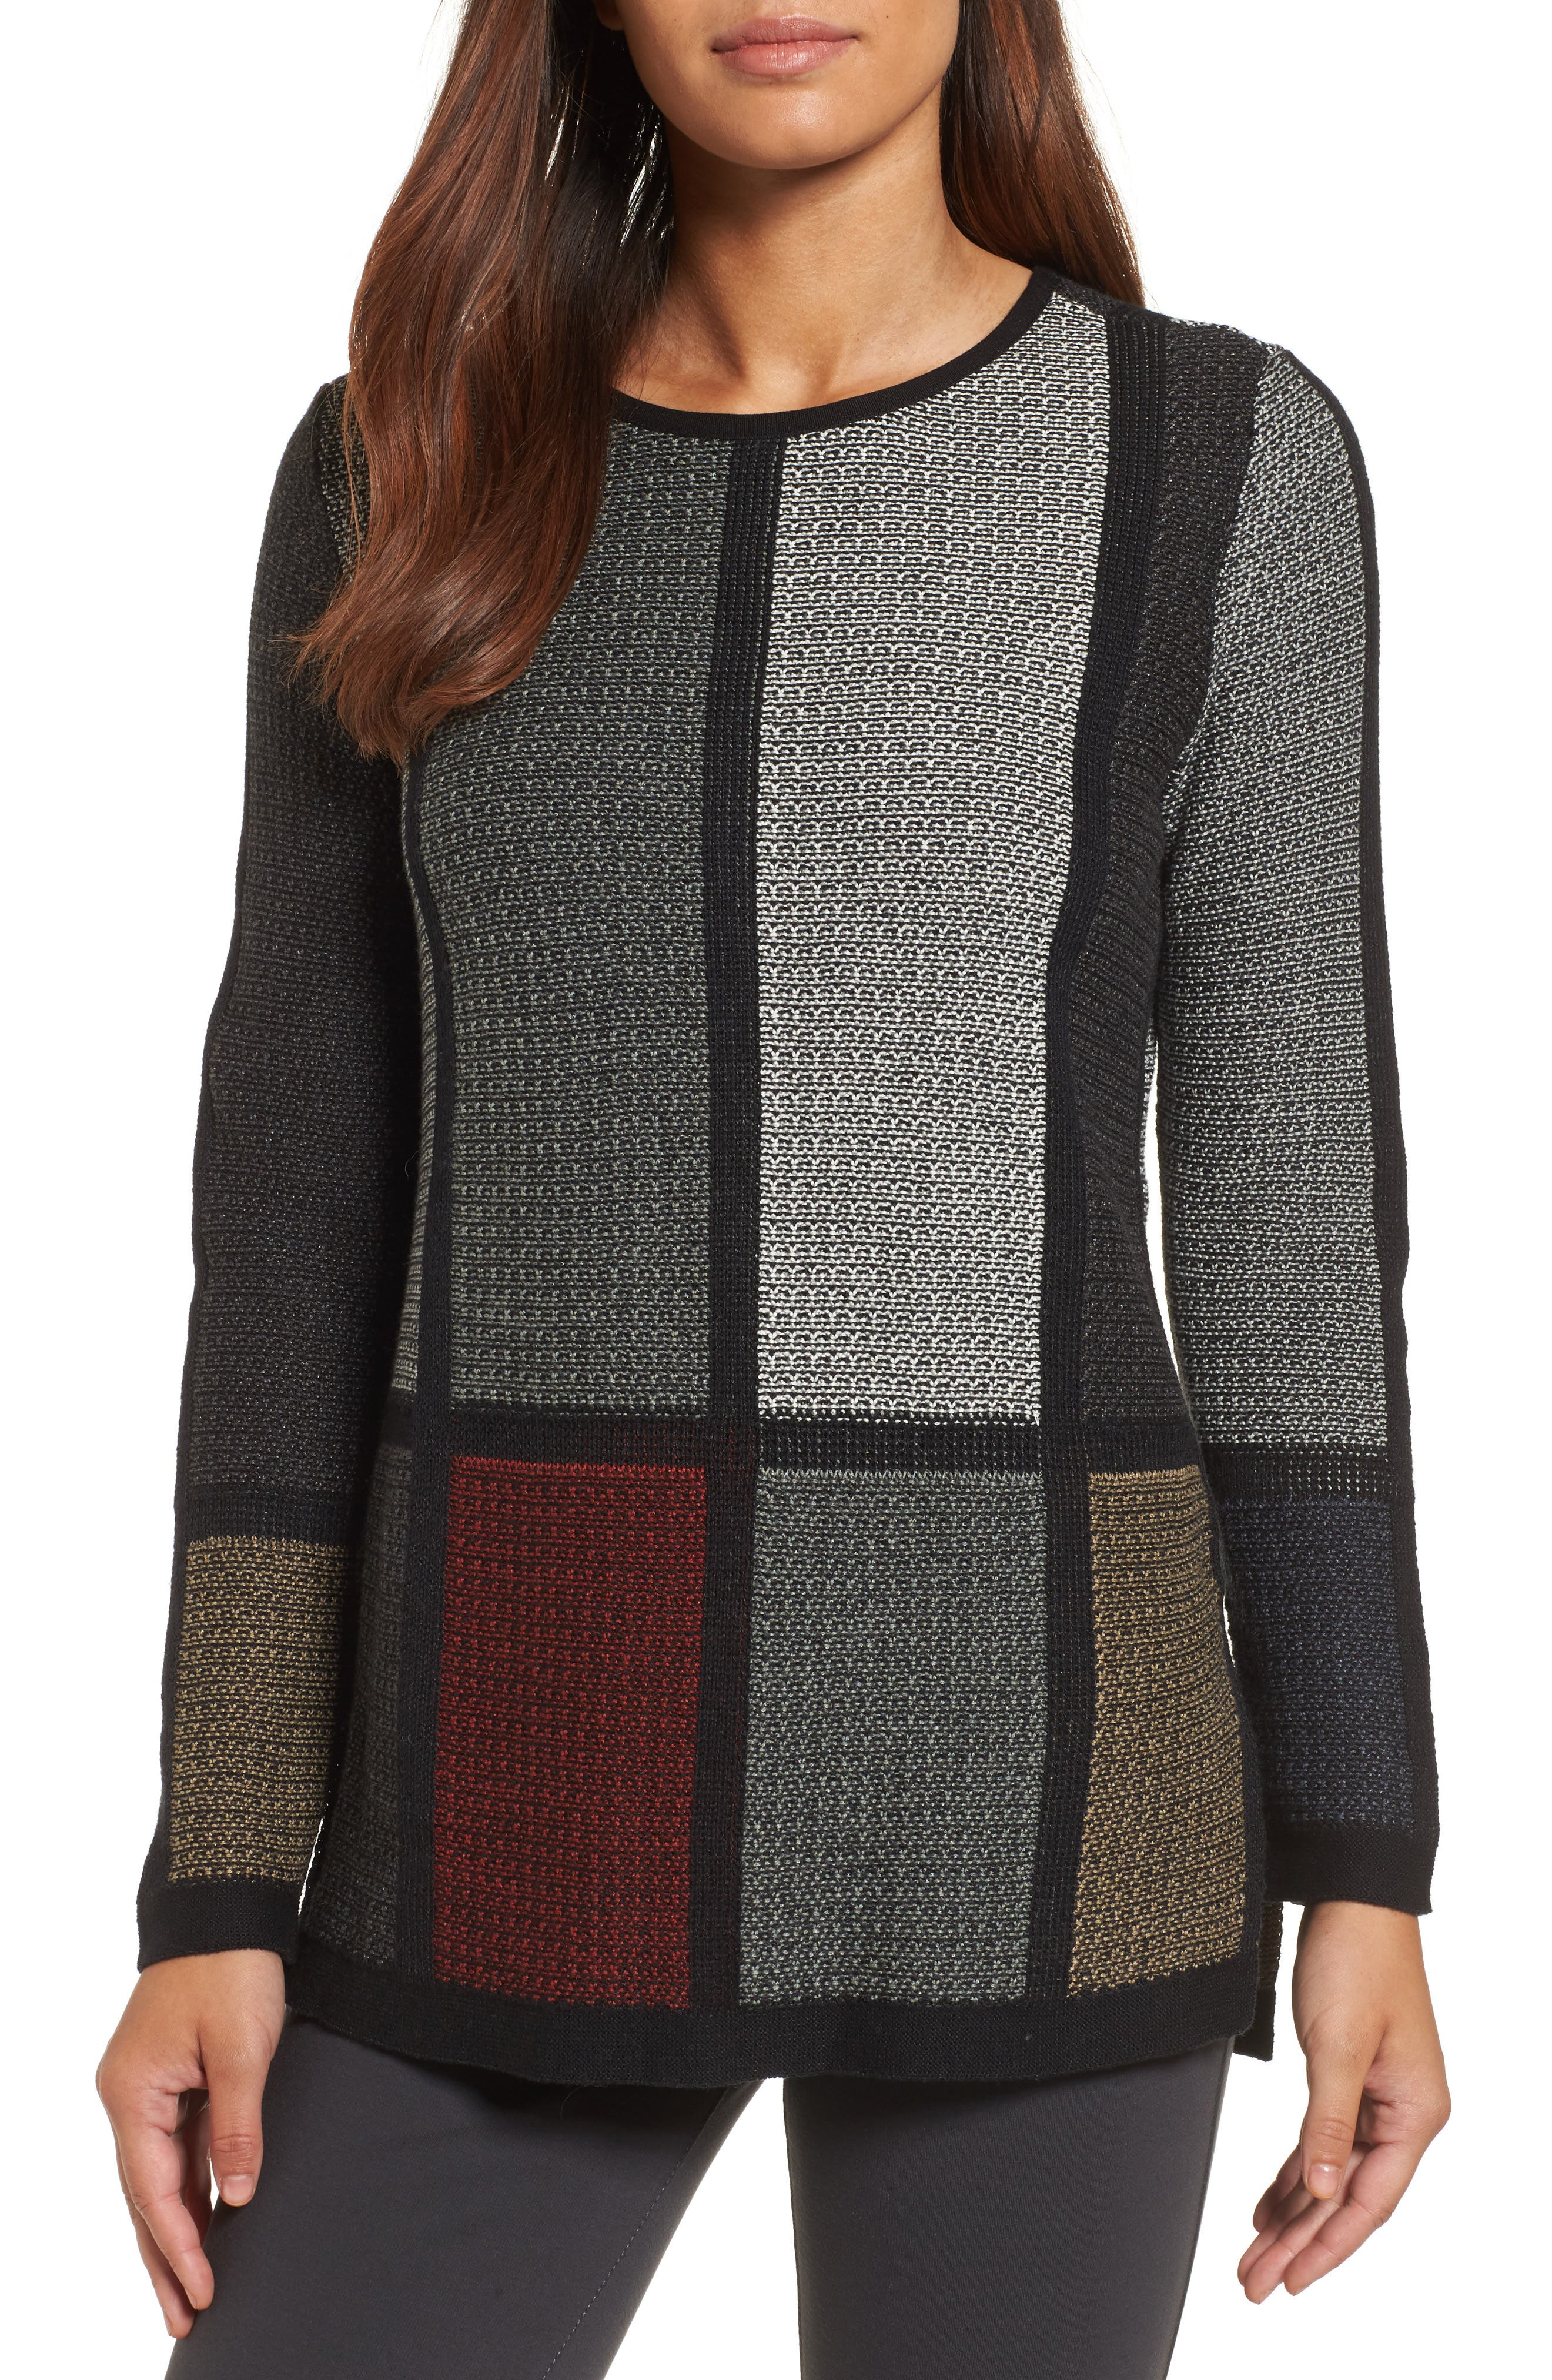 Alternate Image 1 Selected - NIC+ZOE Around the Block Sweater (Regular & Petite)